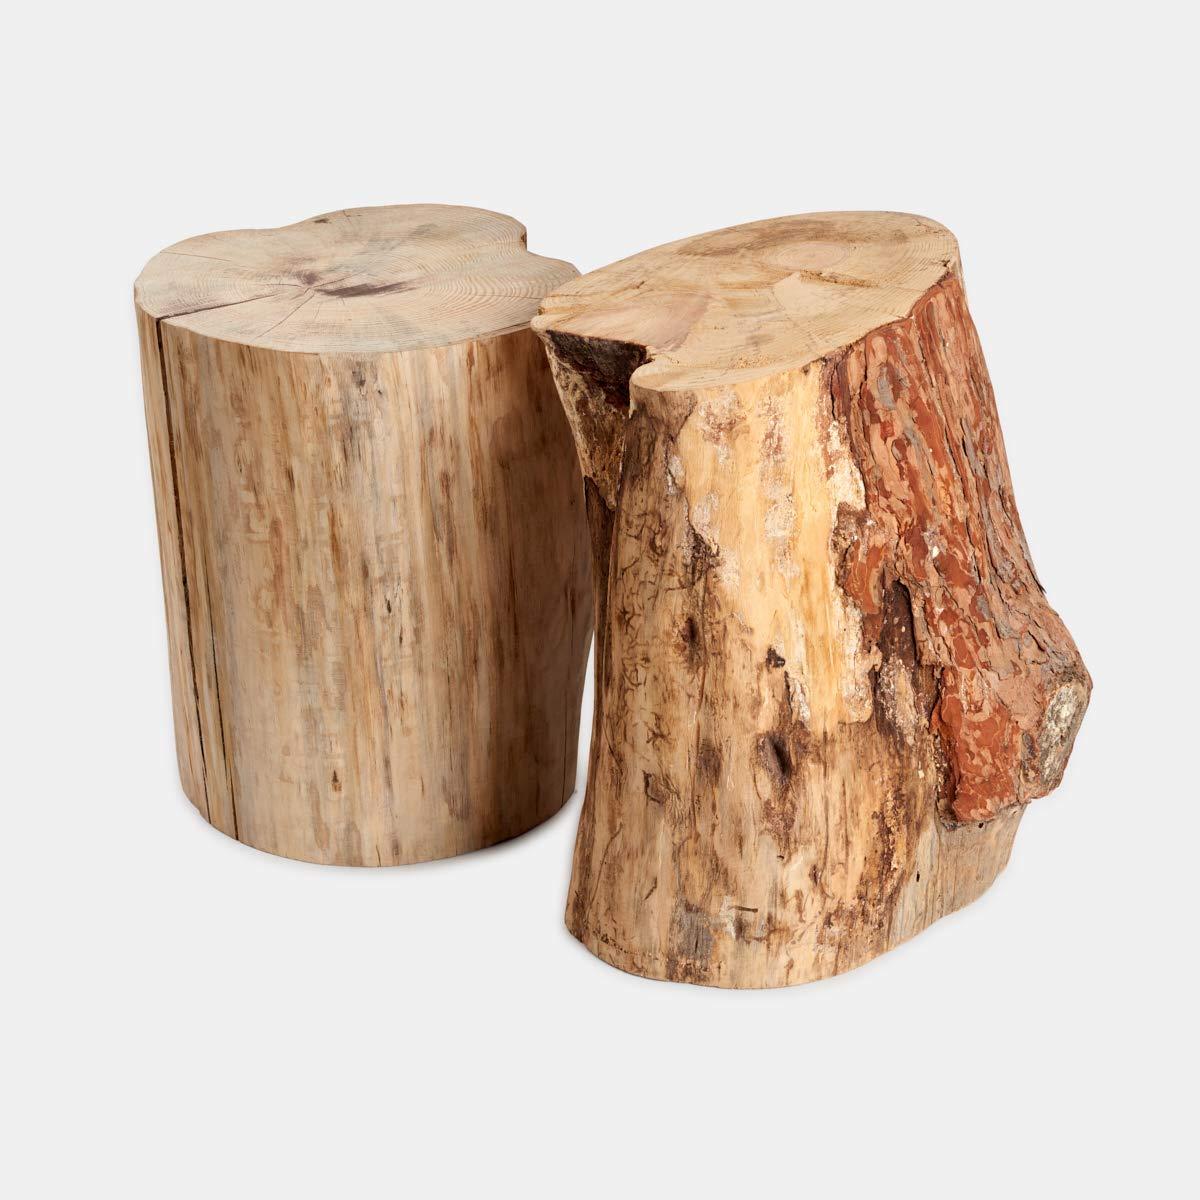 bde8909ba Rebajas Ofertas tocón troncos madera de pino macizo tocon árbol: Amazon.es:  Handmade